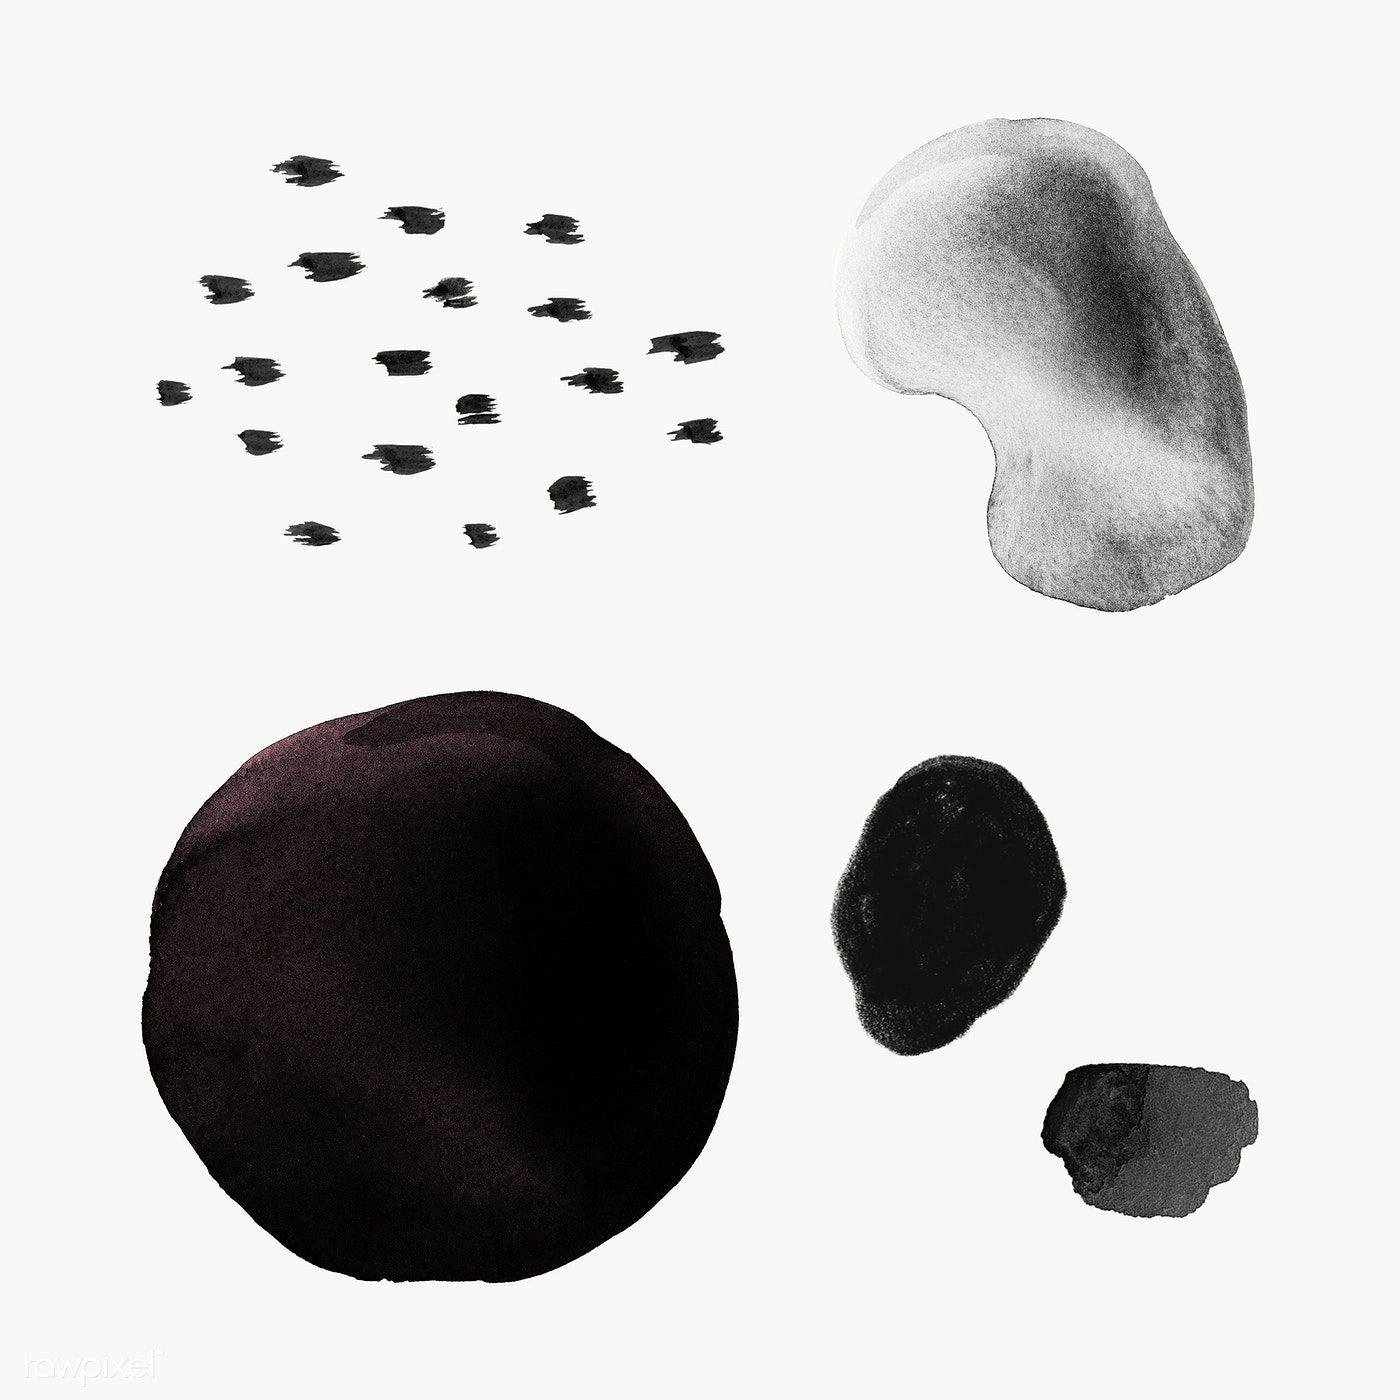 Black Abstract Watercolor Circles Transparent Png Premium Image By Rawpixel Com Sasi Watercolor Circles Abstract Watercolor Abstract Canvas Painting